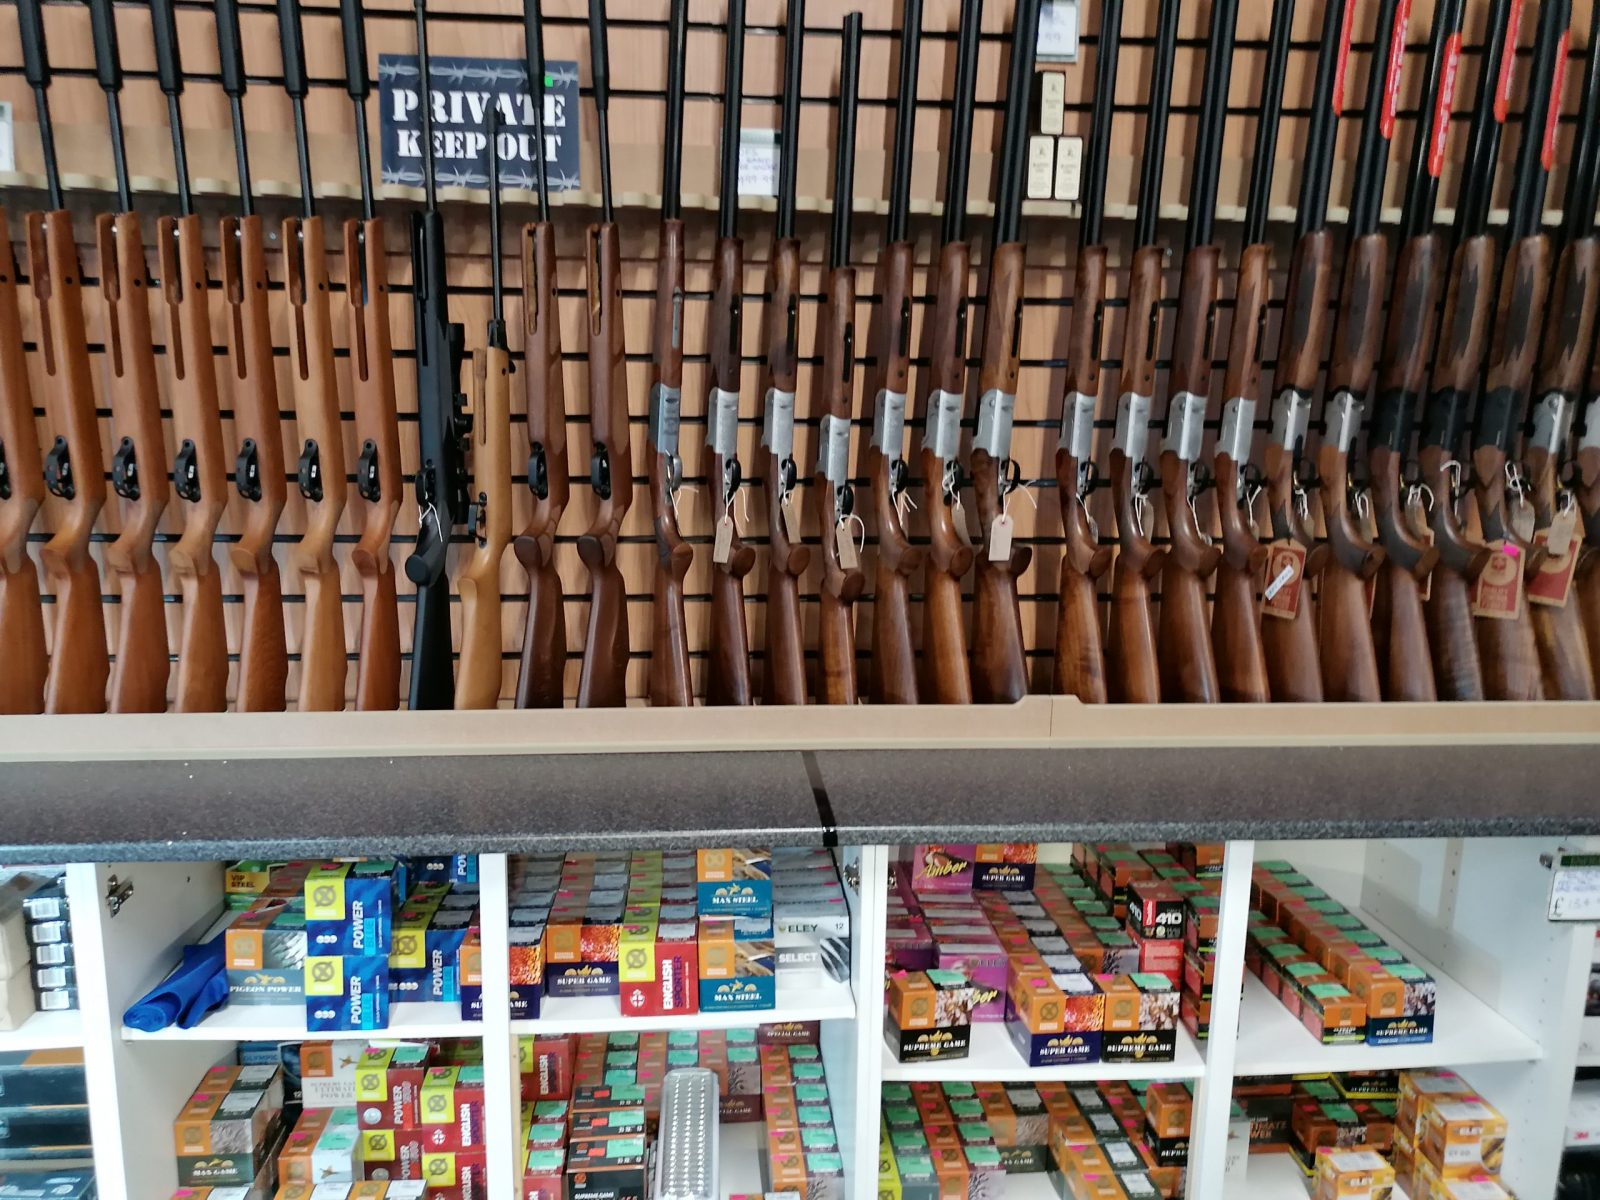 enfield_sports_gun_shop_birmingham